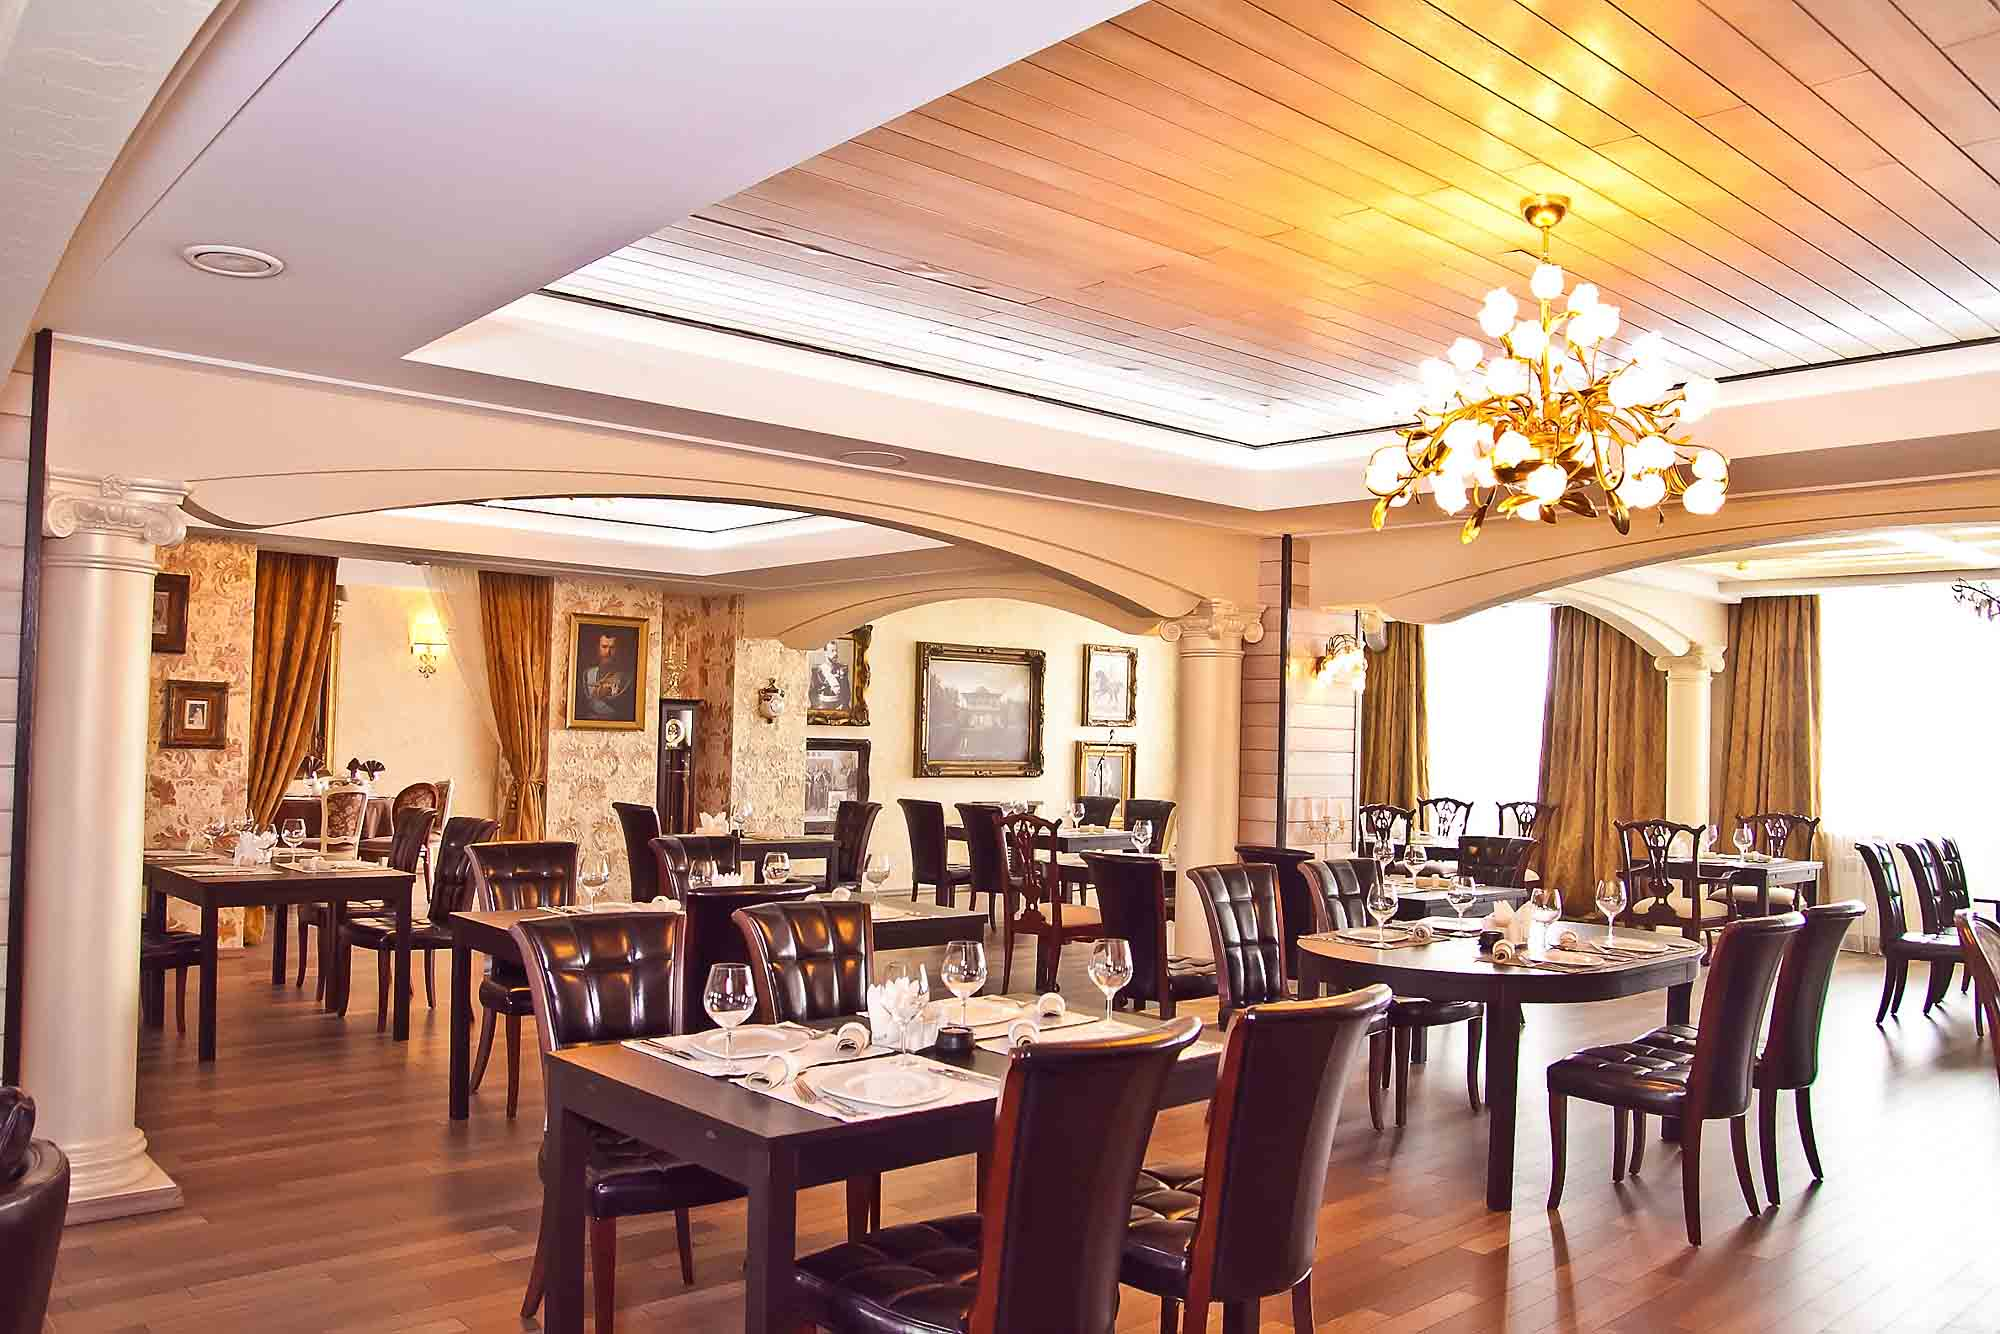 Фото песня года ресторан барнаул 5